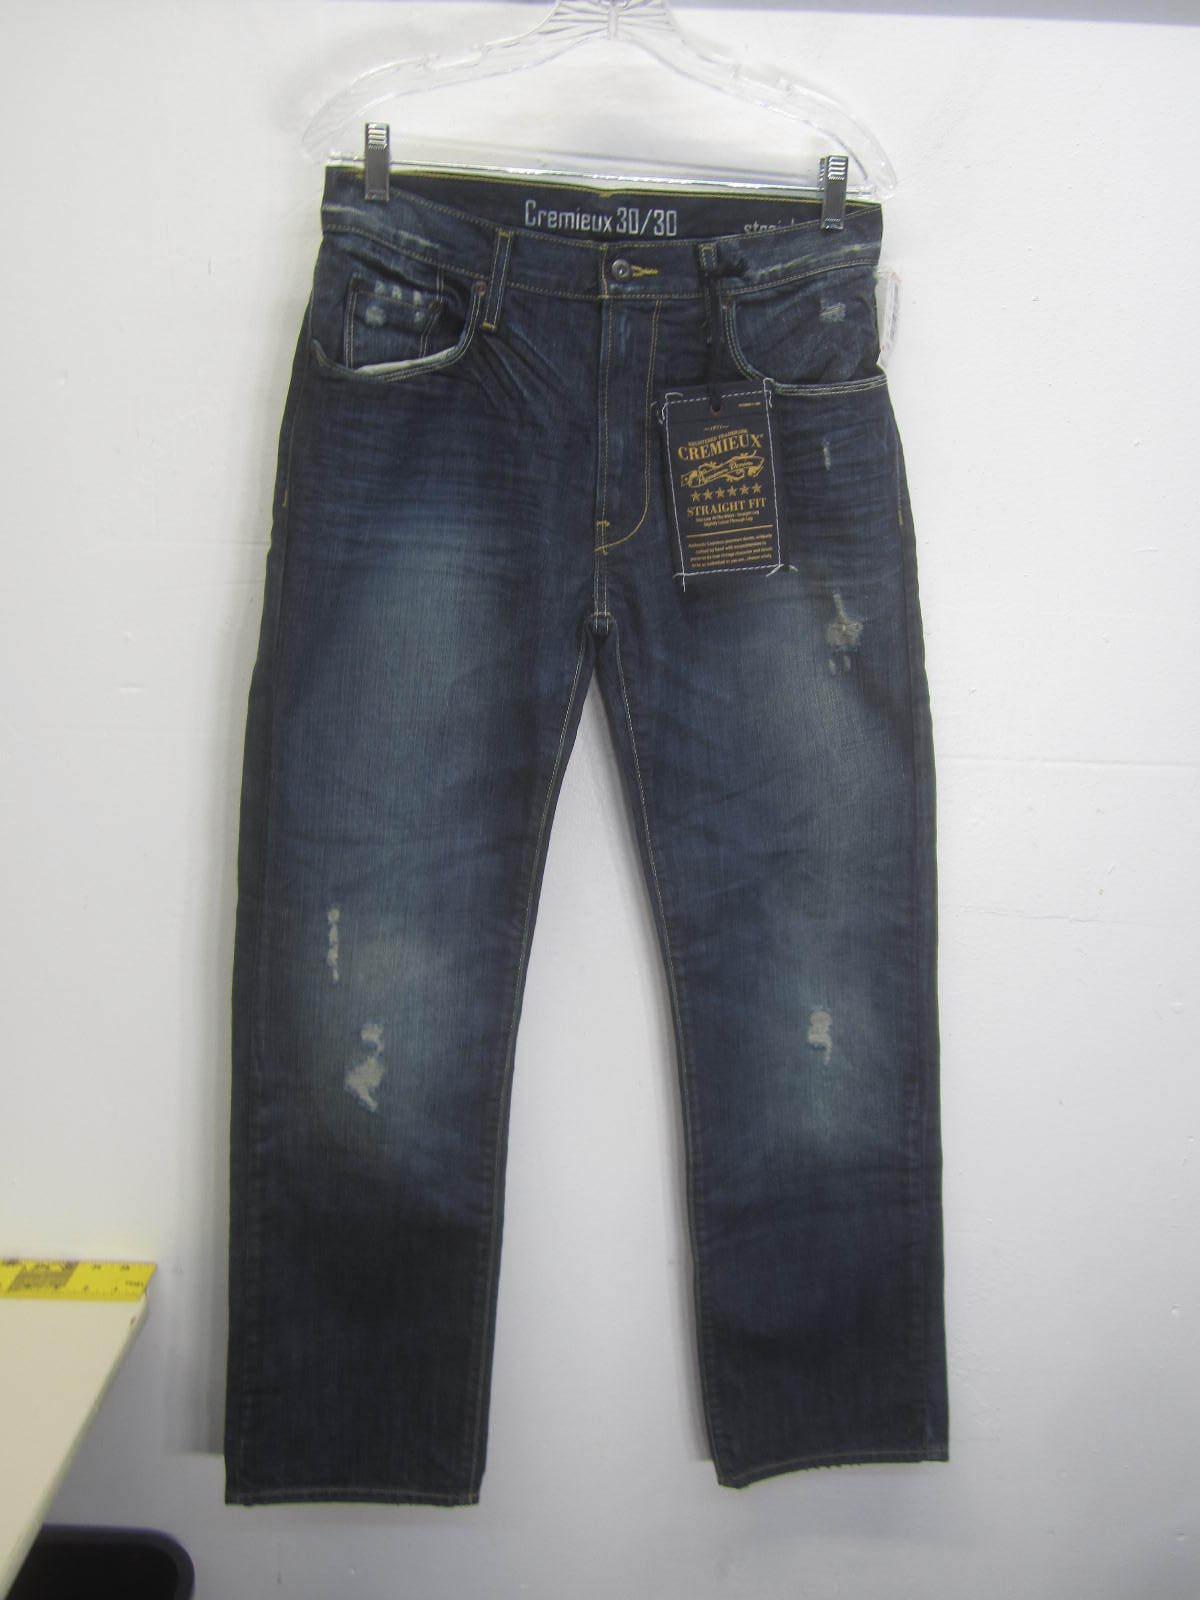 NWT Daniel Cremieux bluee Jeans dark wash distressed straight leg sz 30x30